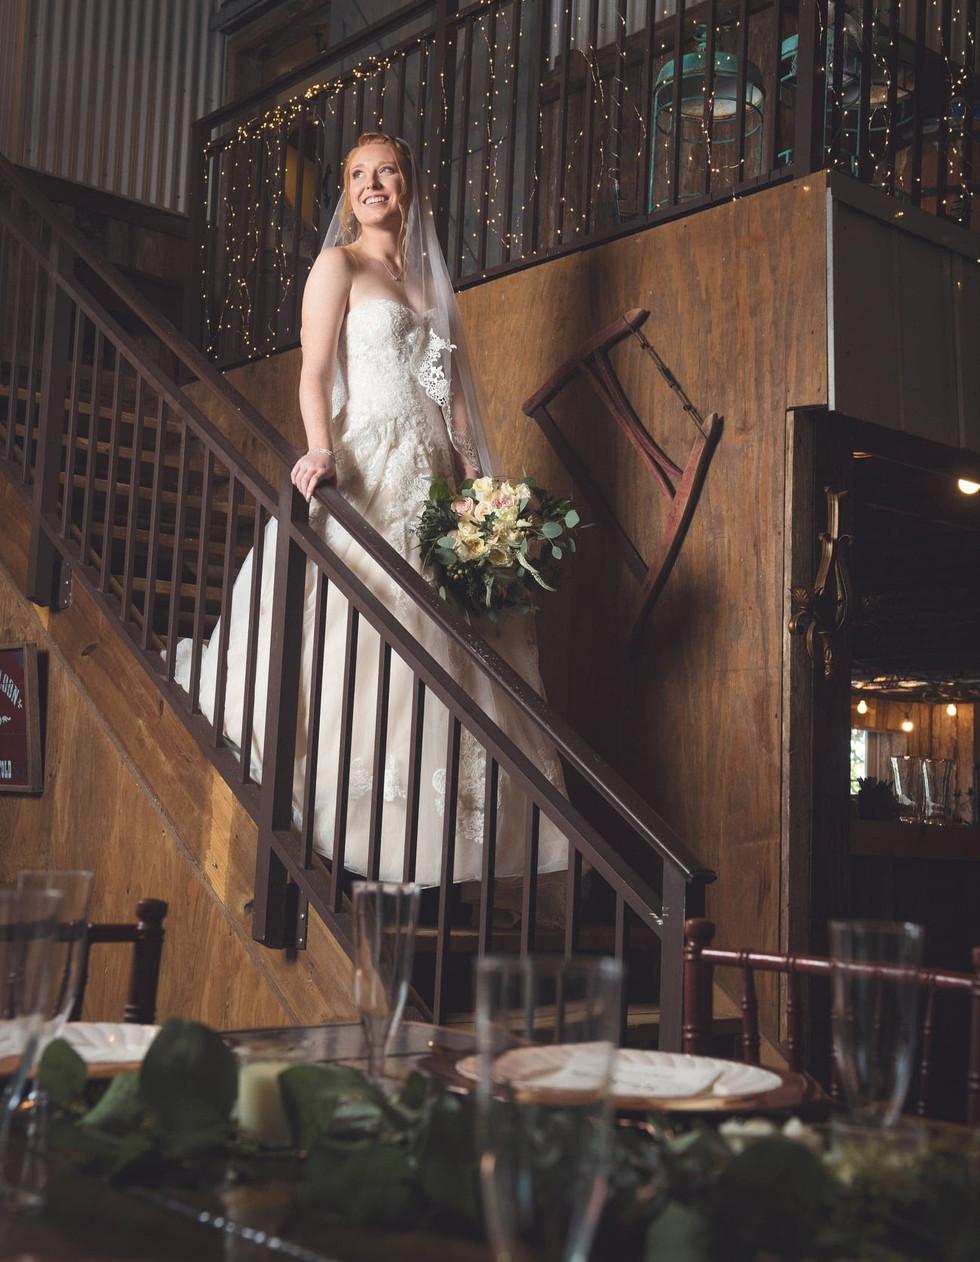 Bride Staircase.jpg